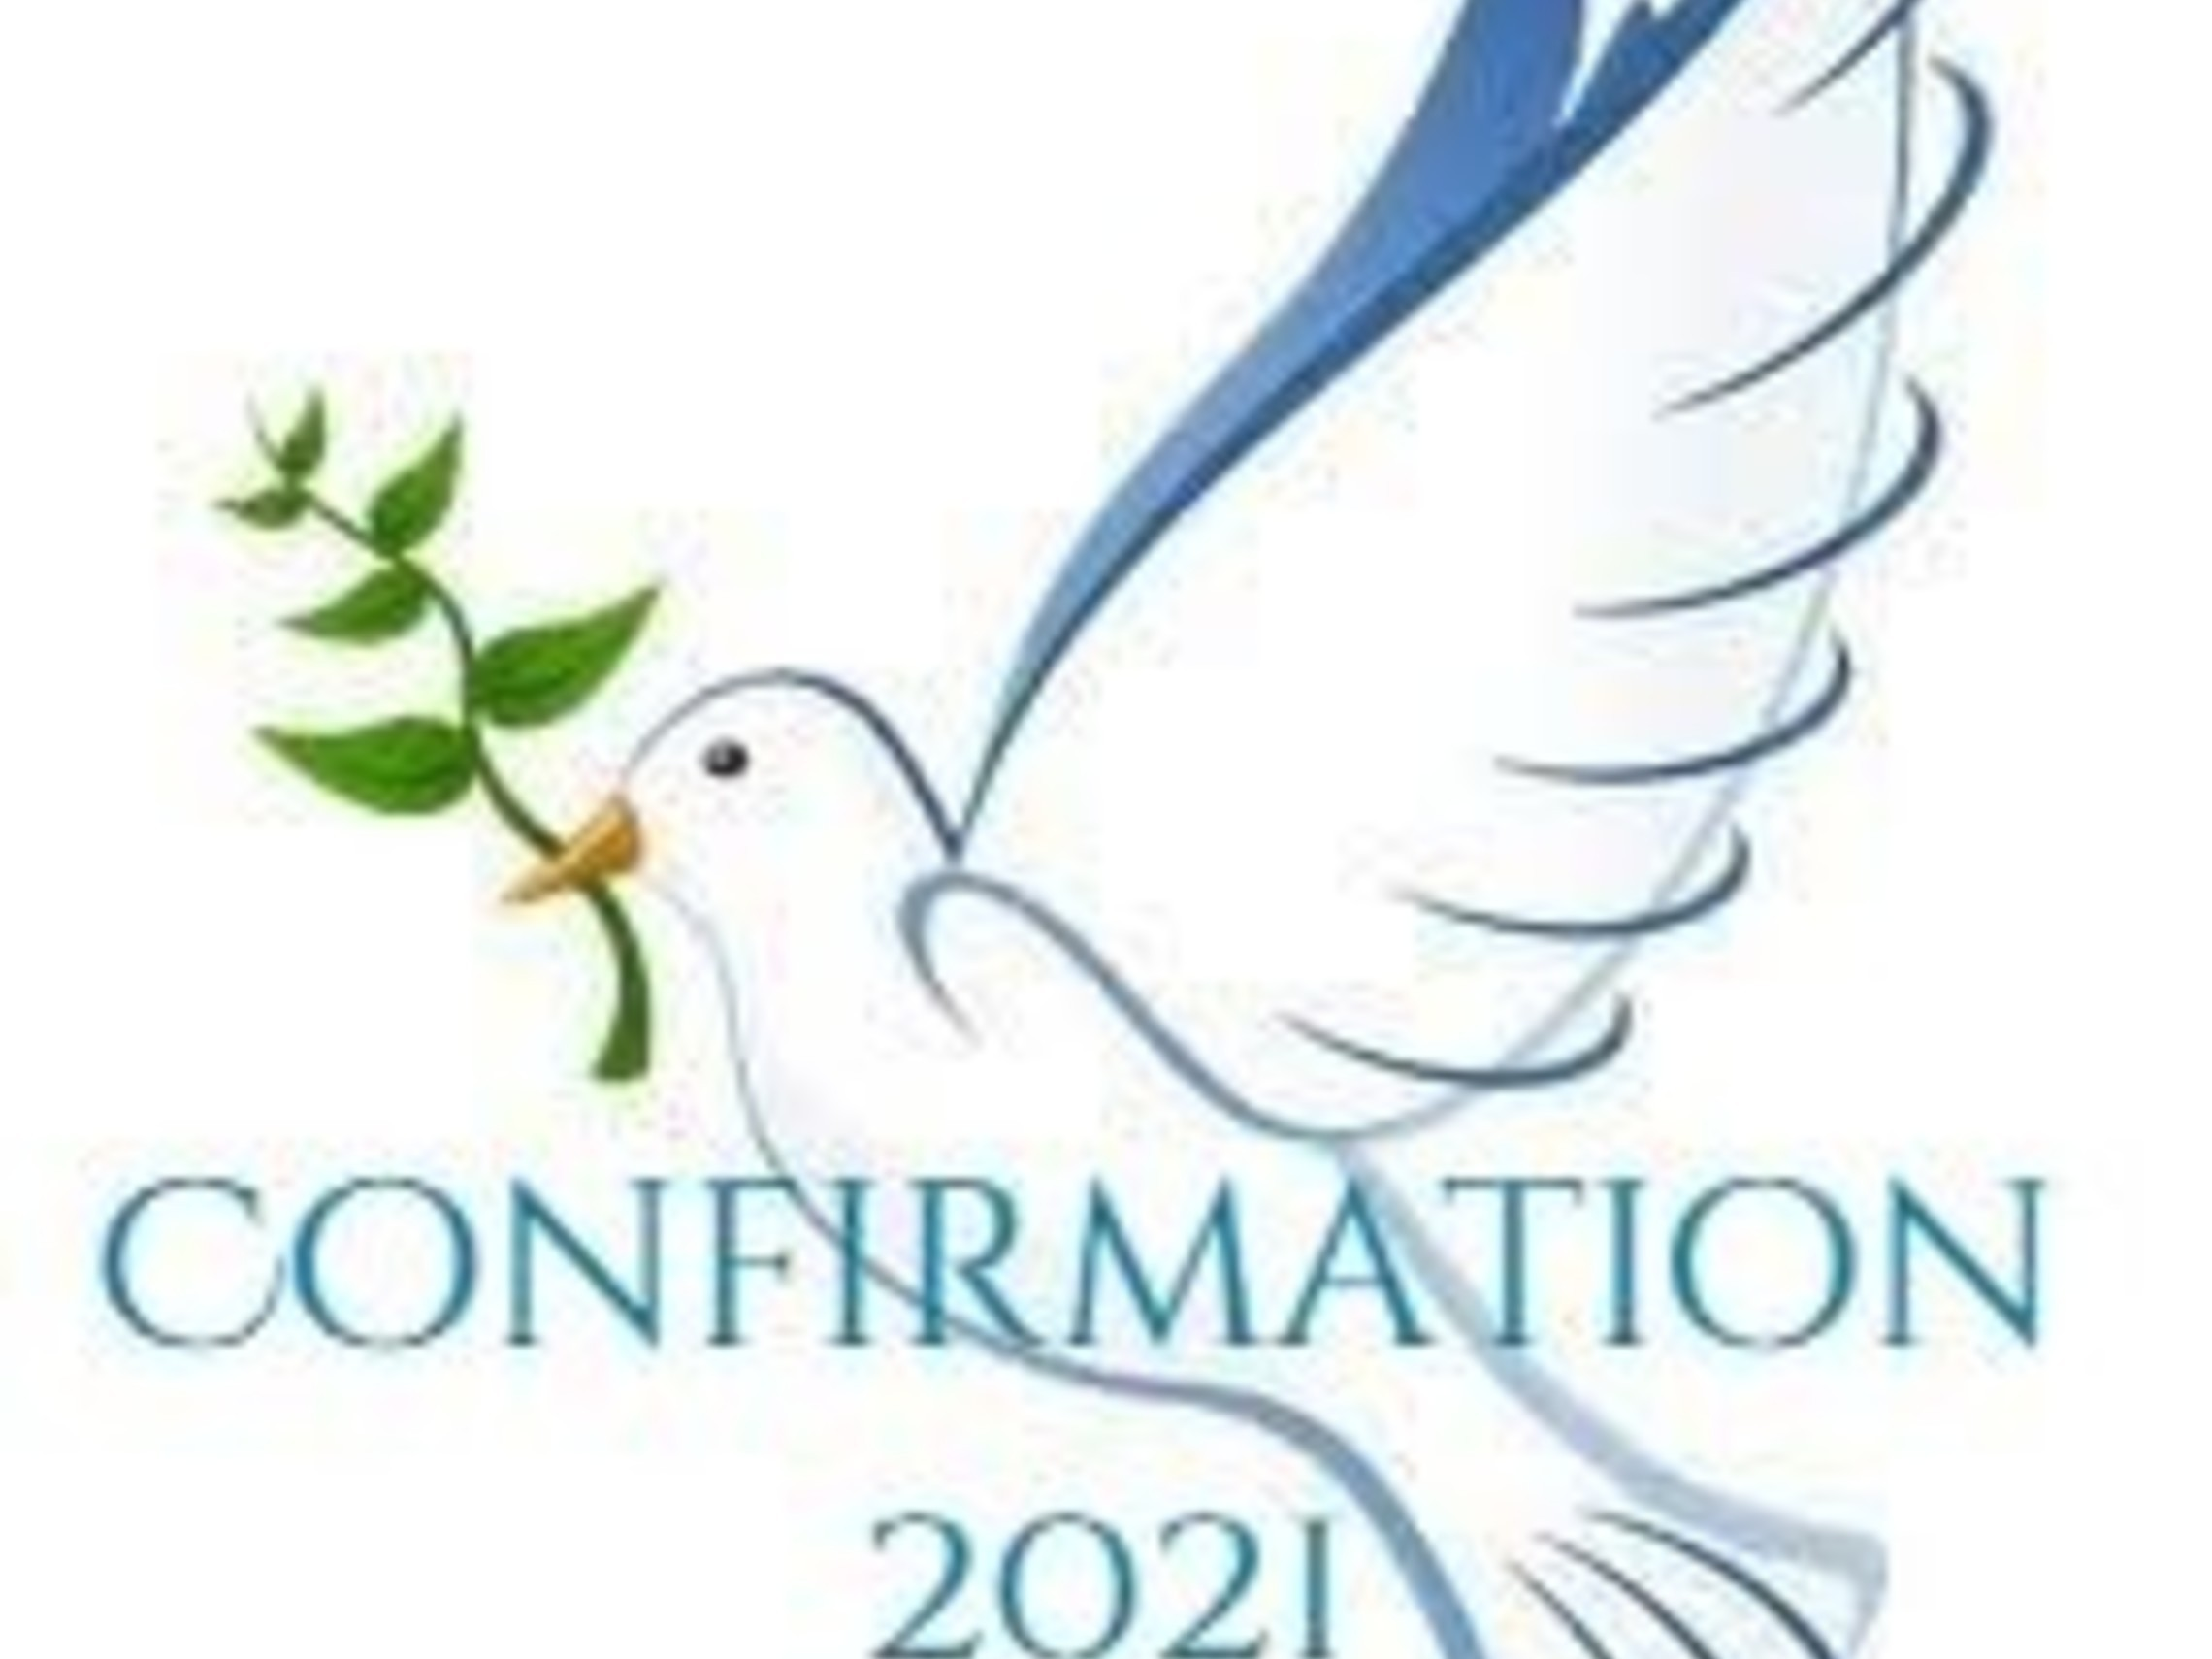 Confirmation 2021